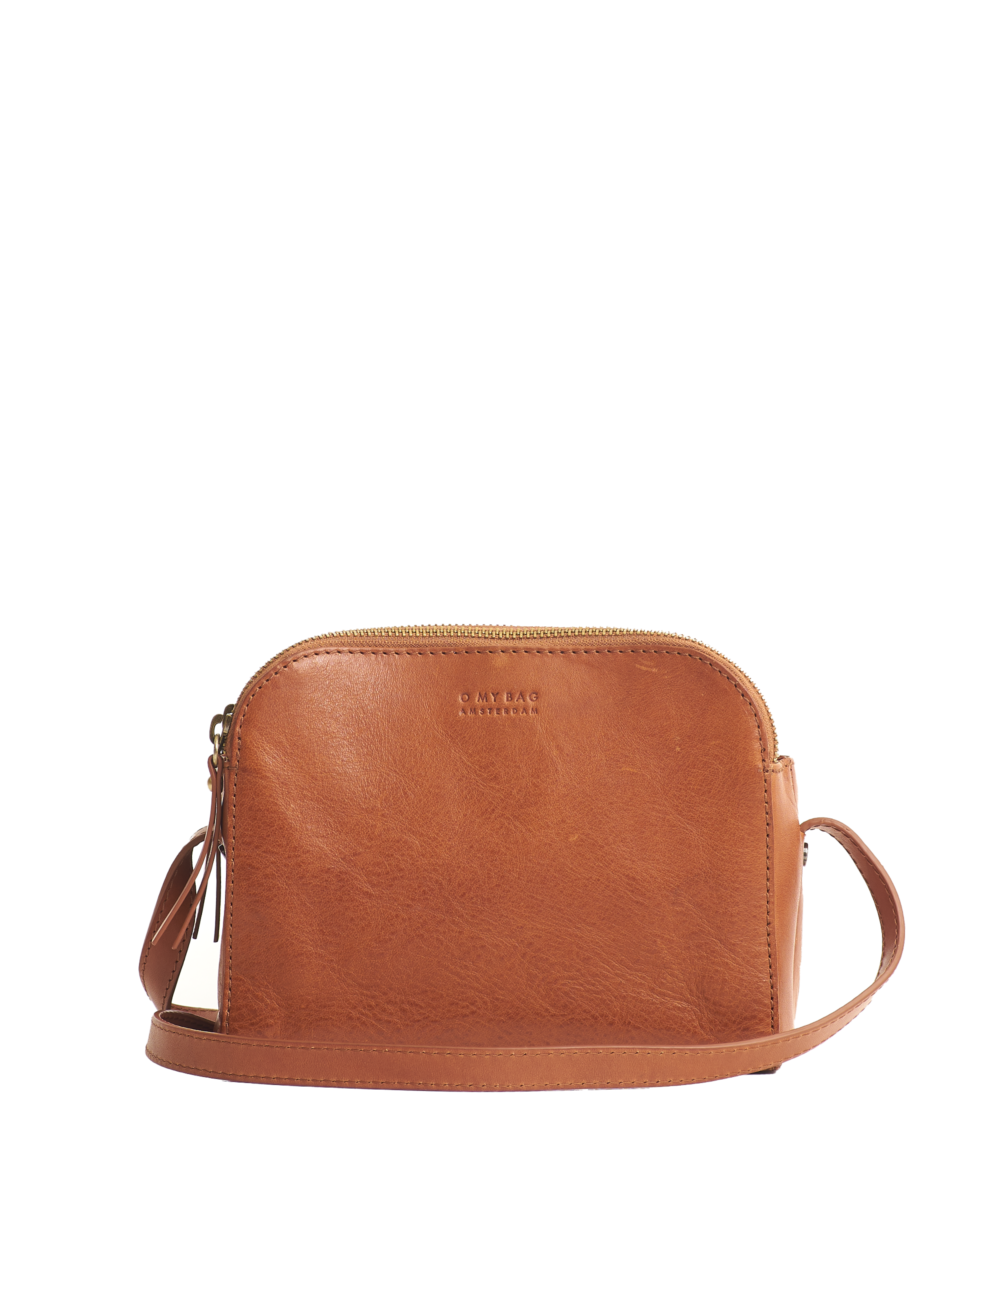 Handtas Emily | cognac stromboli leather strap